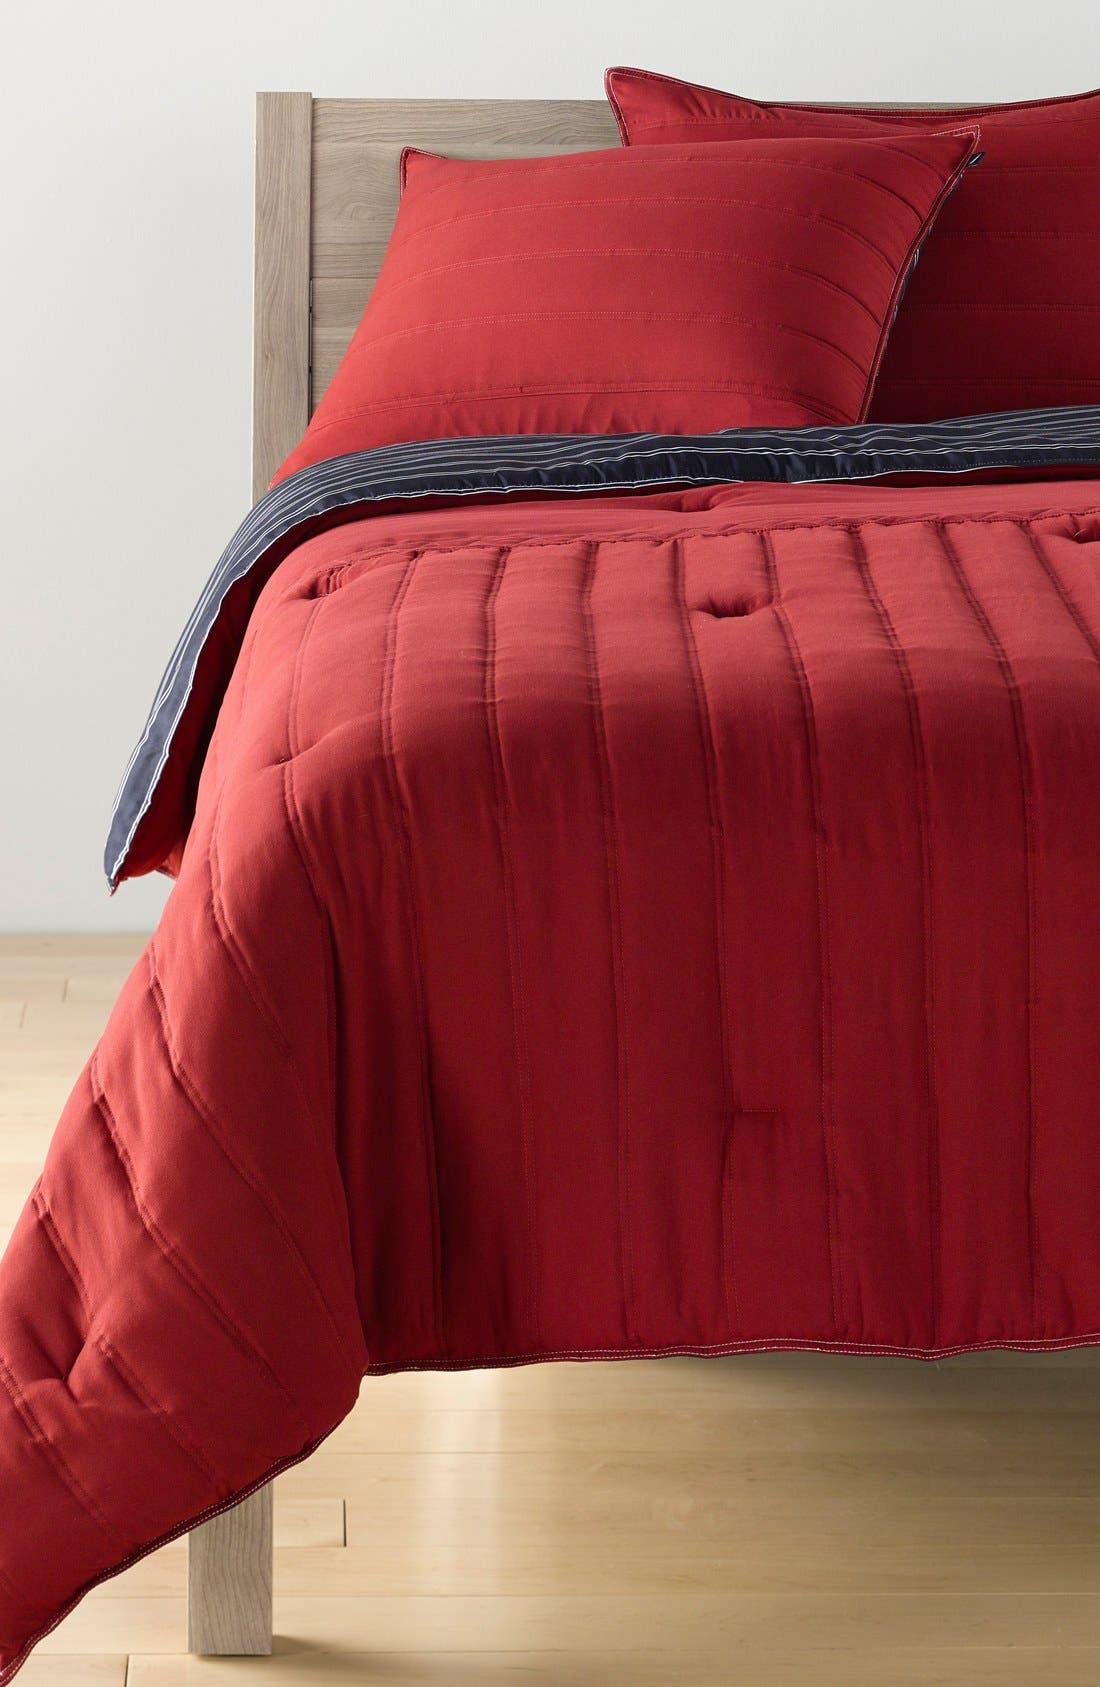 Main Image - Nautica Mainsail Quilted Comforter & Sham Set